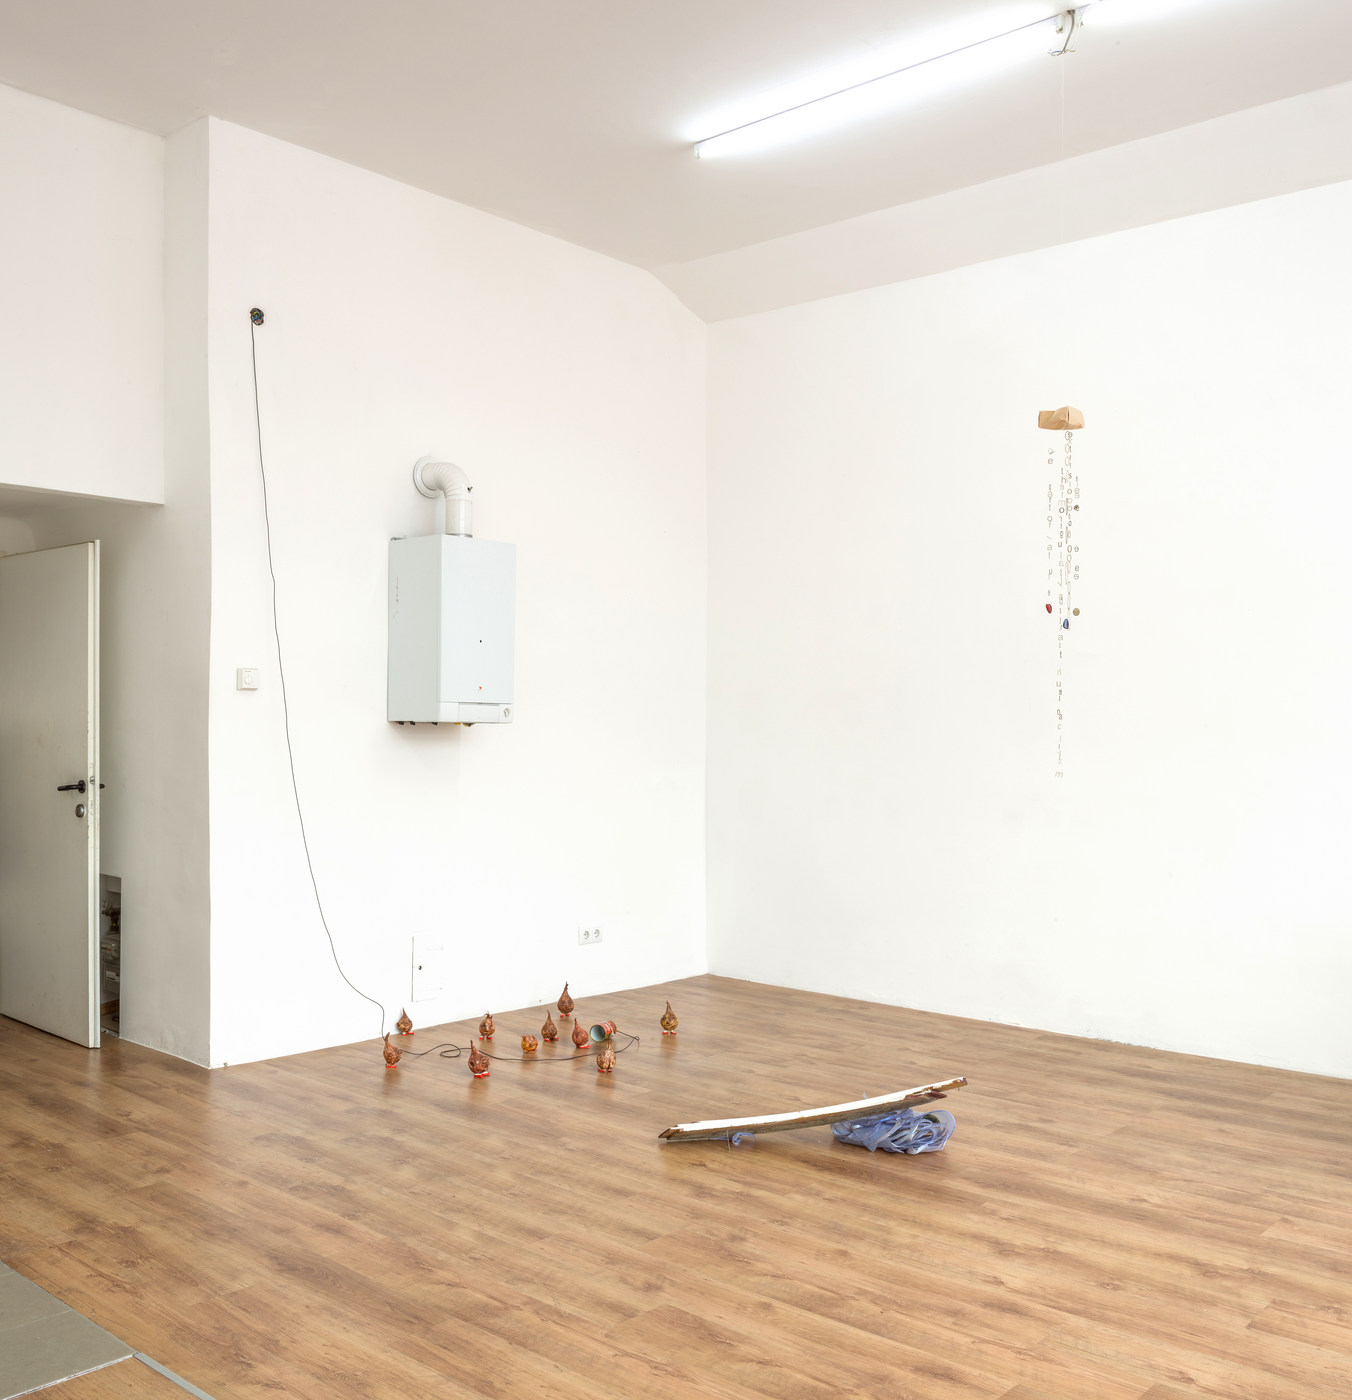 installation shot 3